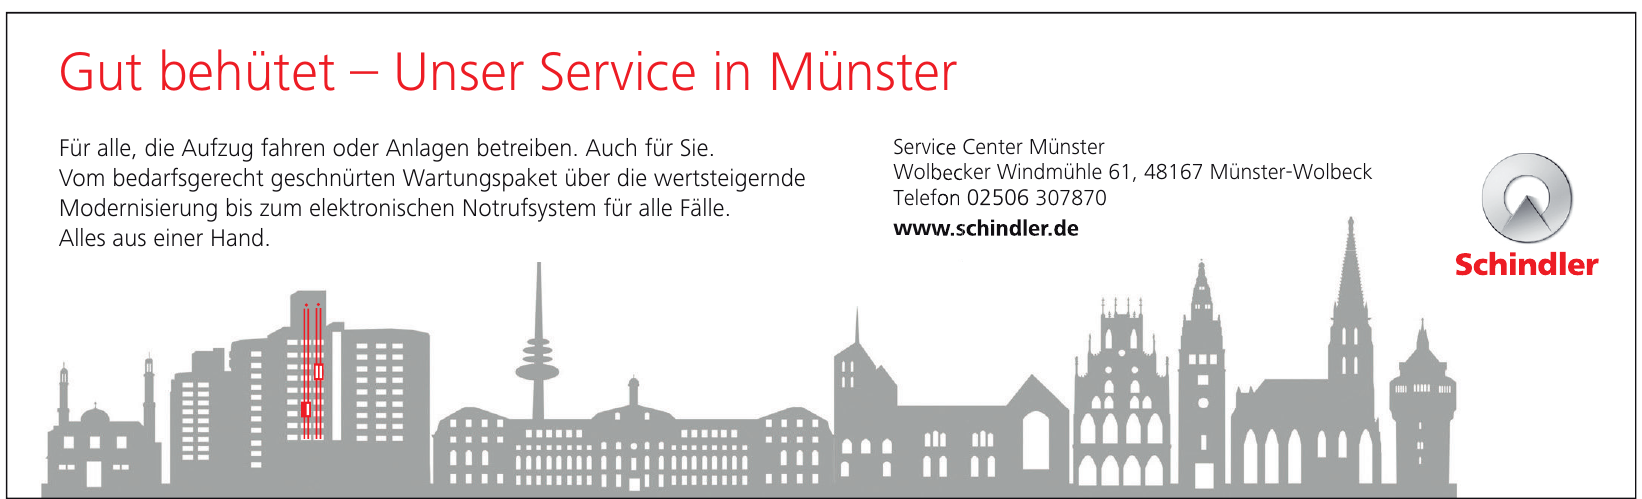 Service Center Münster